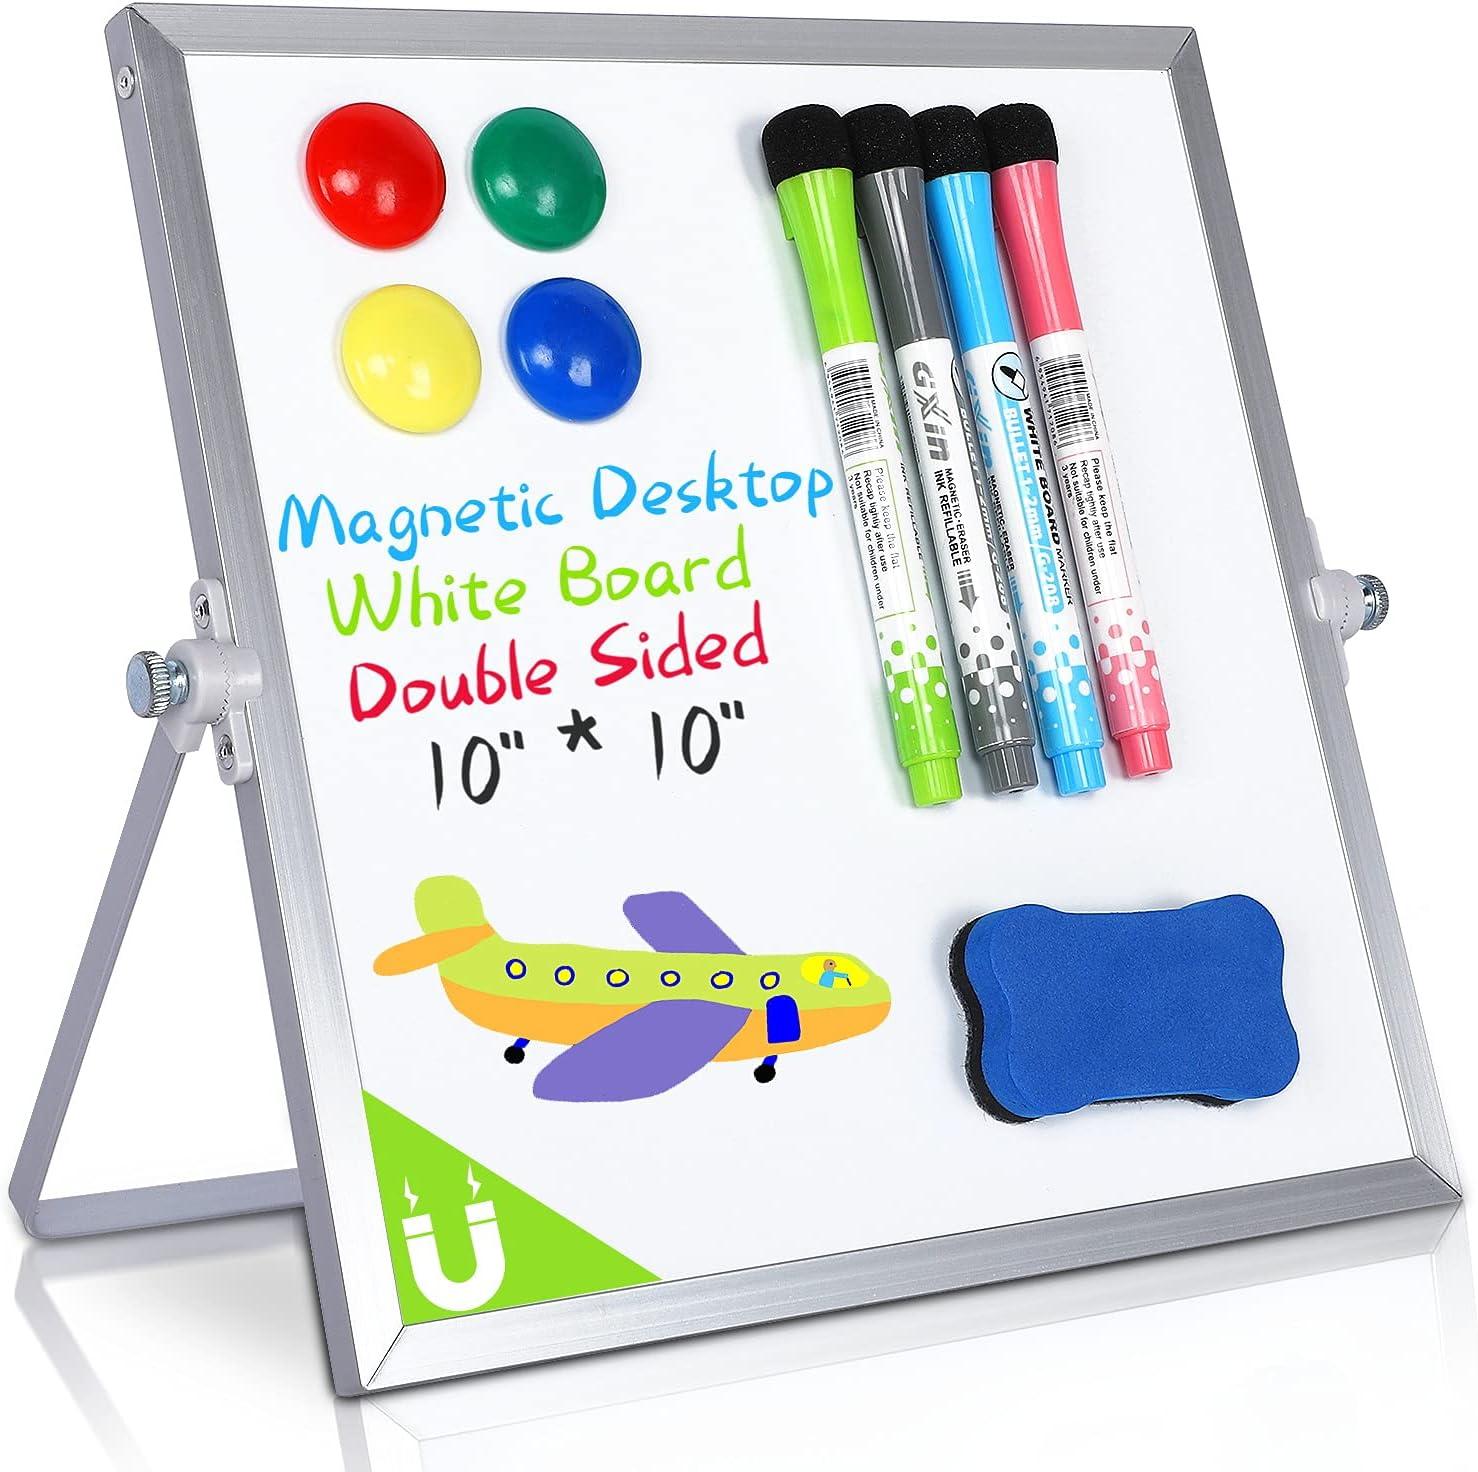 Magnetic Desktop Dry Erase White Board, 10